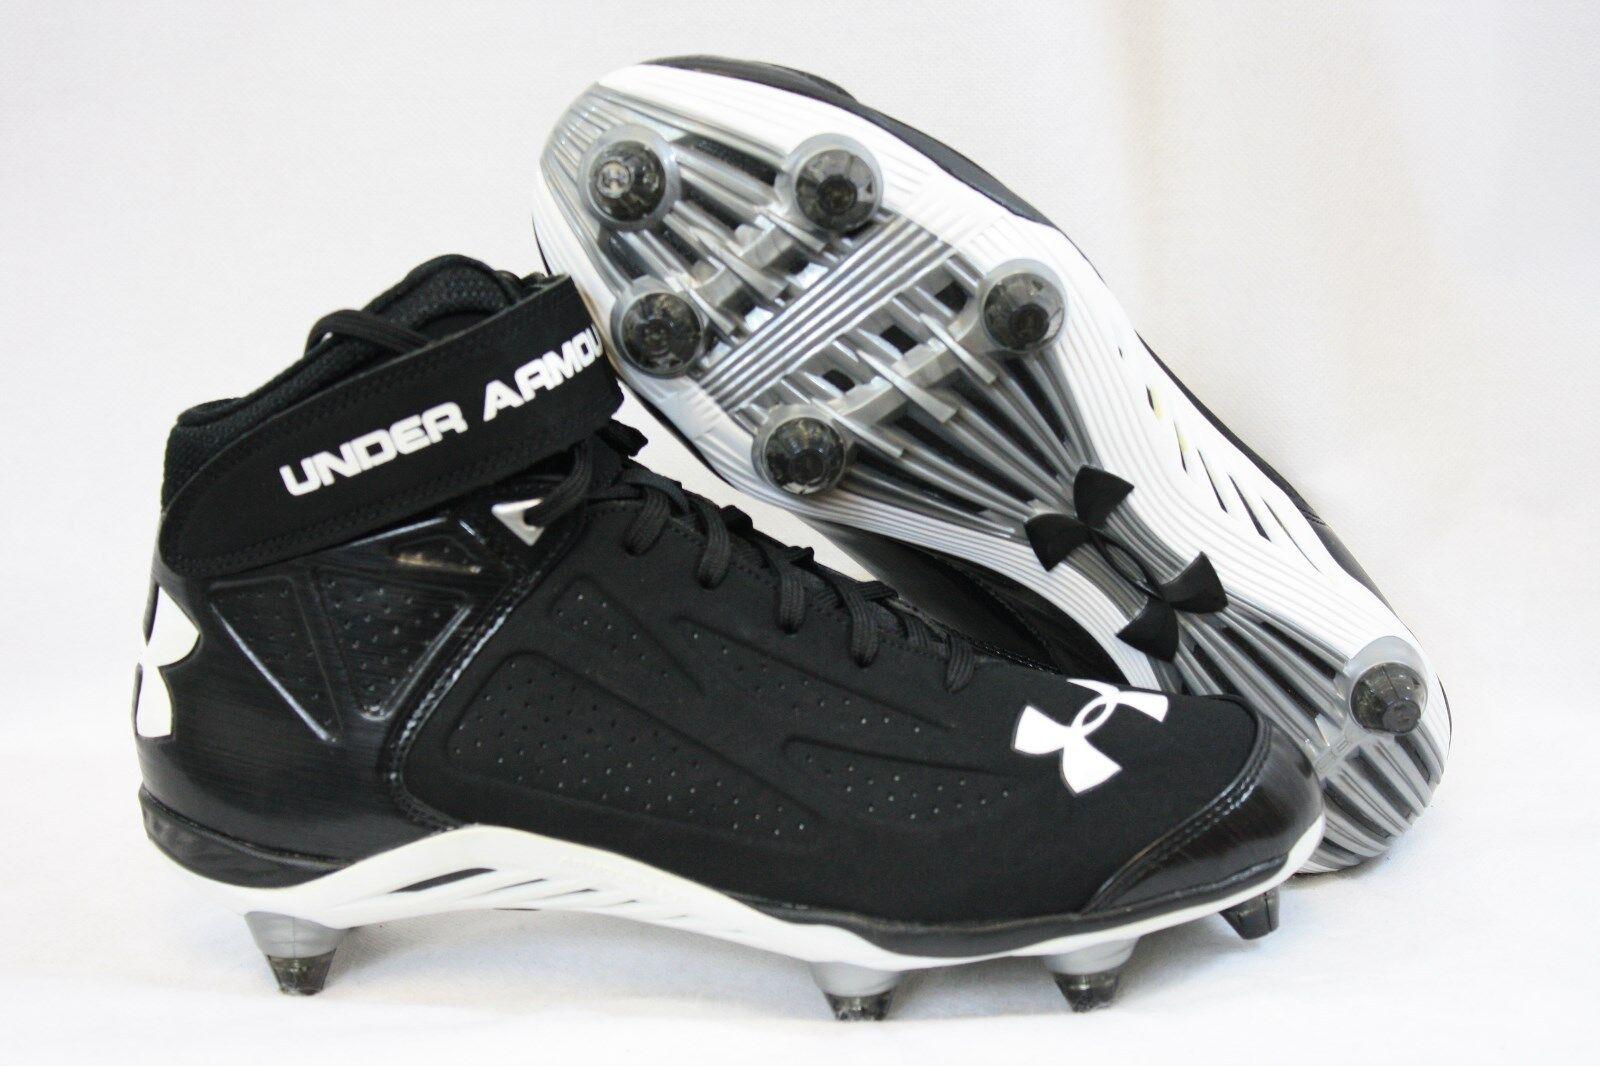 NEW Mens UNDER ARMOUR UA Run N Gun D 1235873 011 Black Football Cleats Shoes